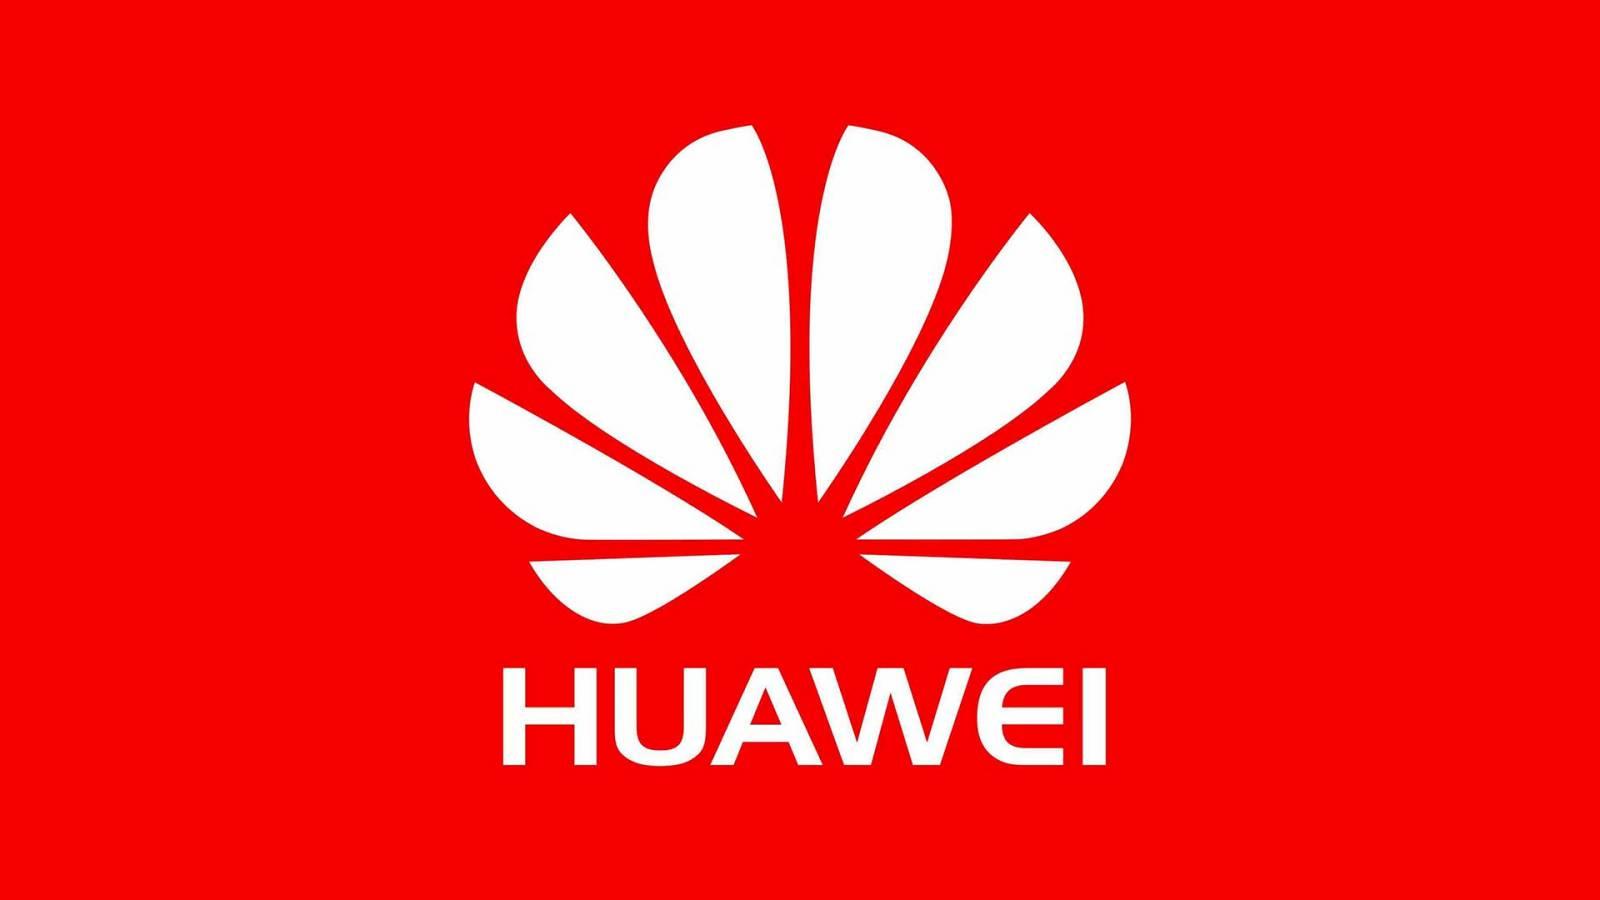 huawei boicot apple